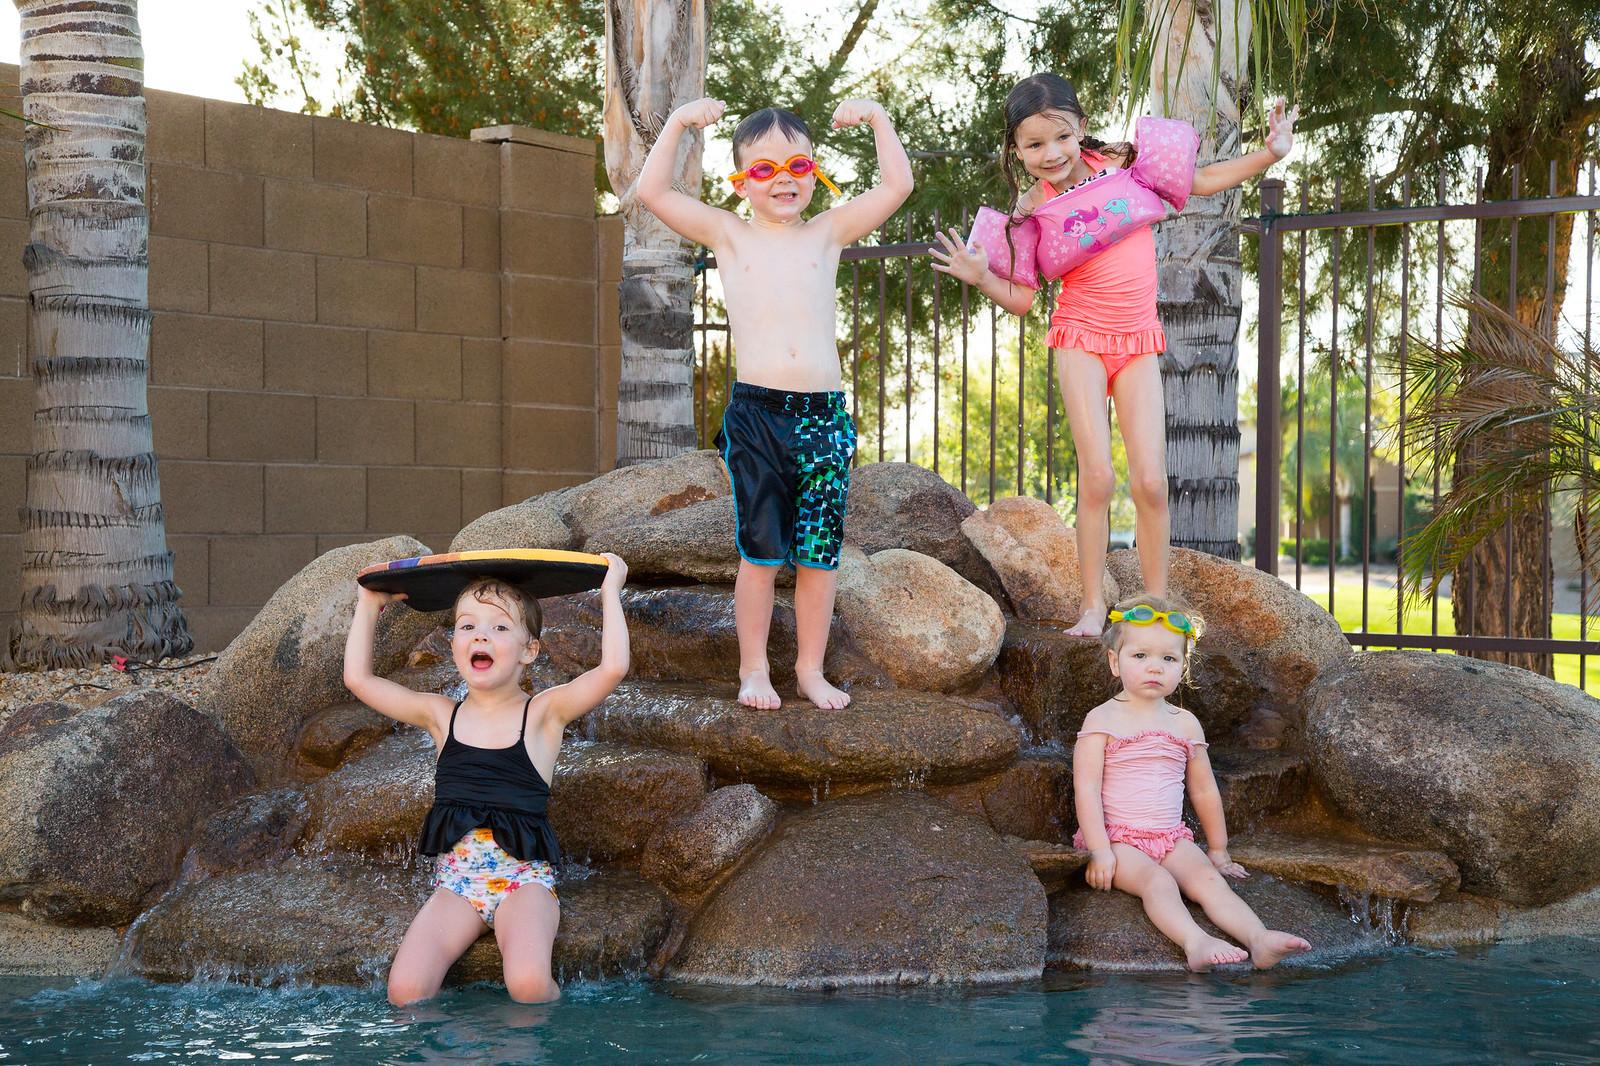 2015-03-12 Arizona-6337.jpg